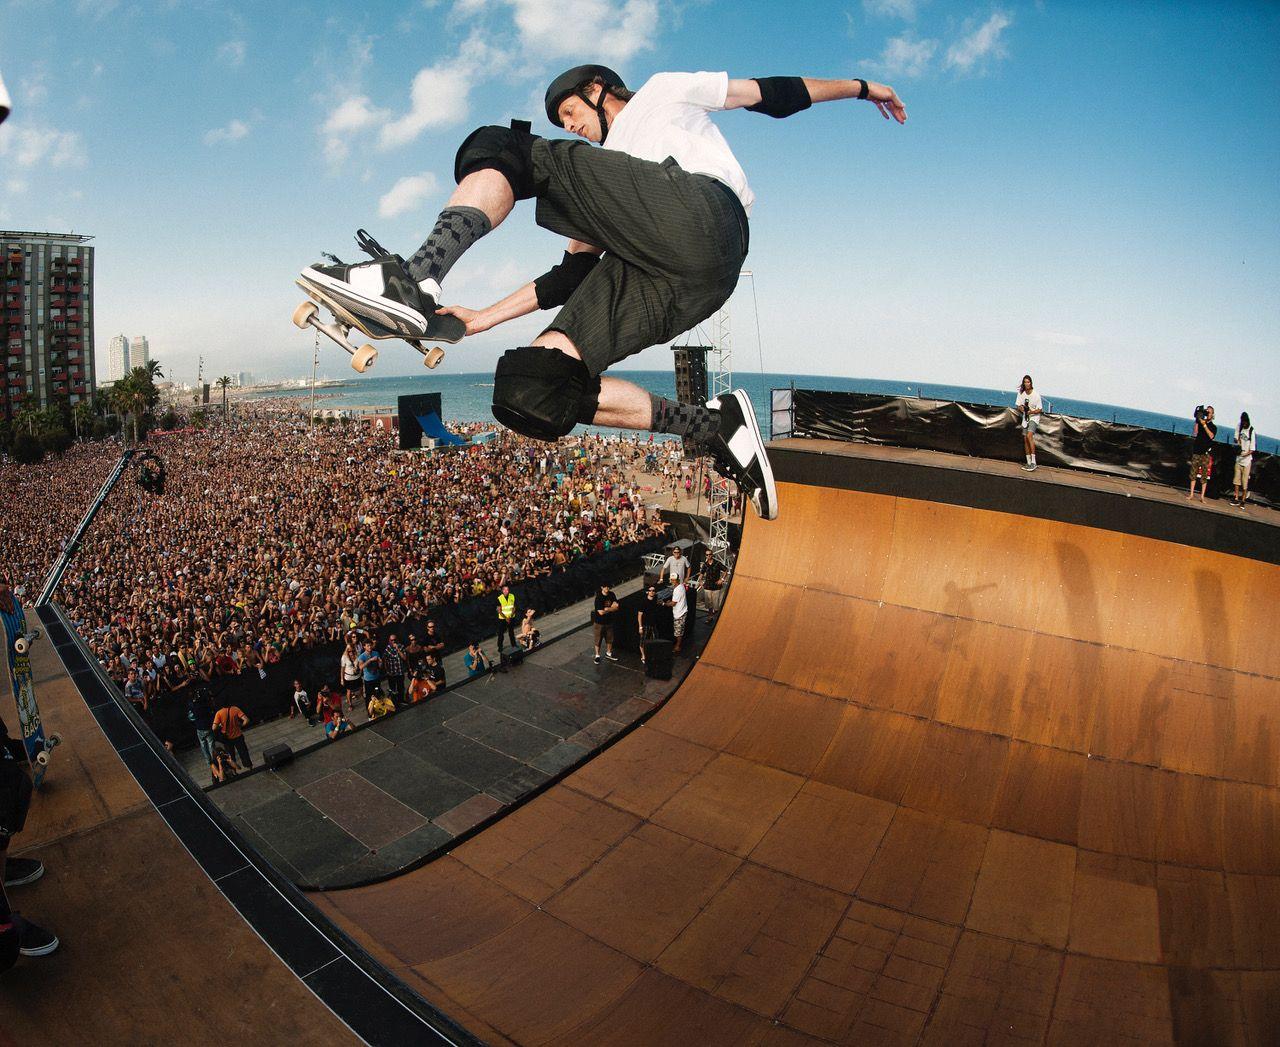 Tony Hawk at 50: Skateboarding Legend Talks Career, Fame ...